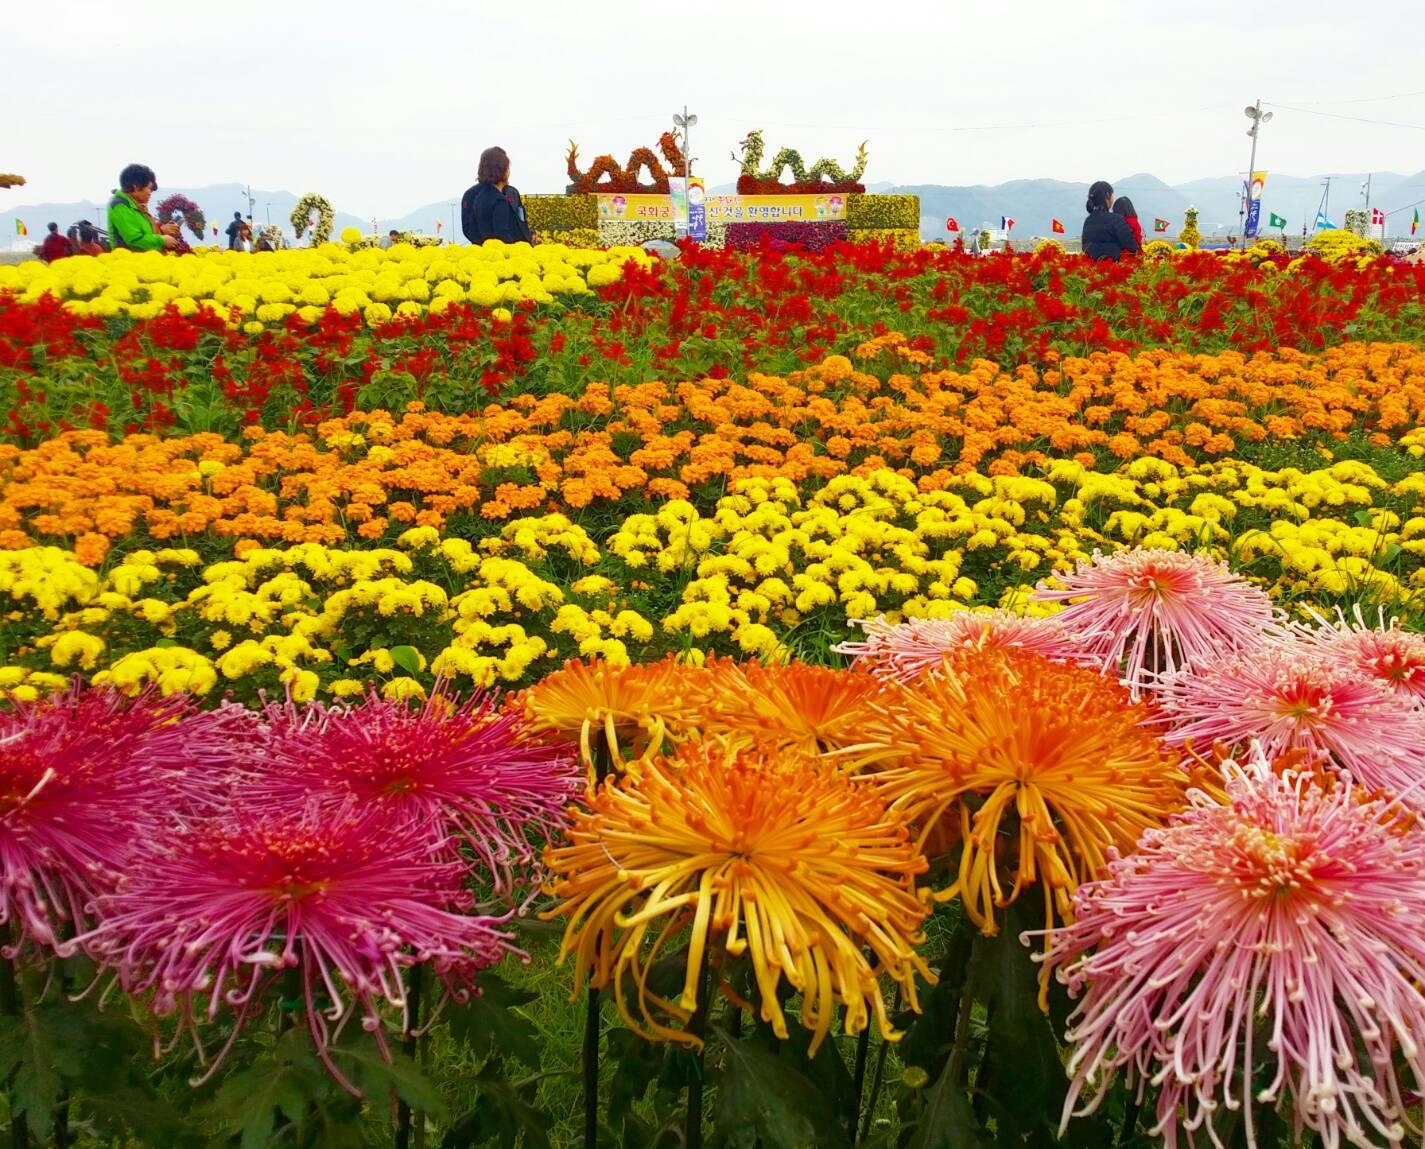 馬山菊祭り_d0160145_15232338.jpg